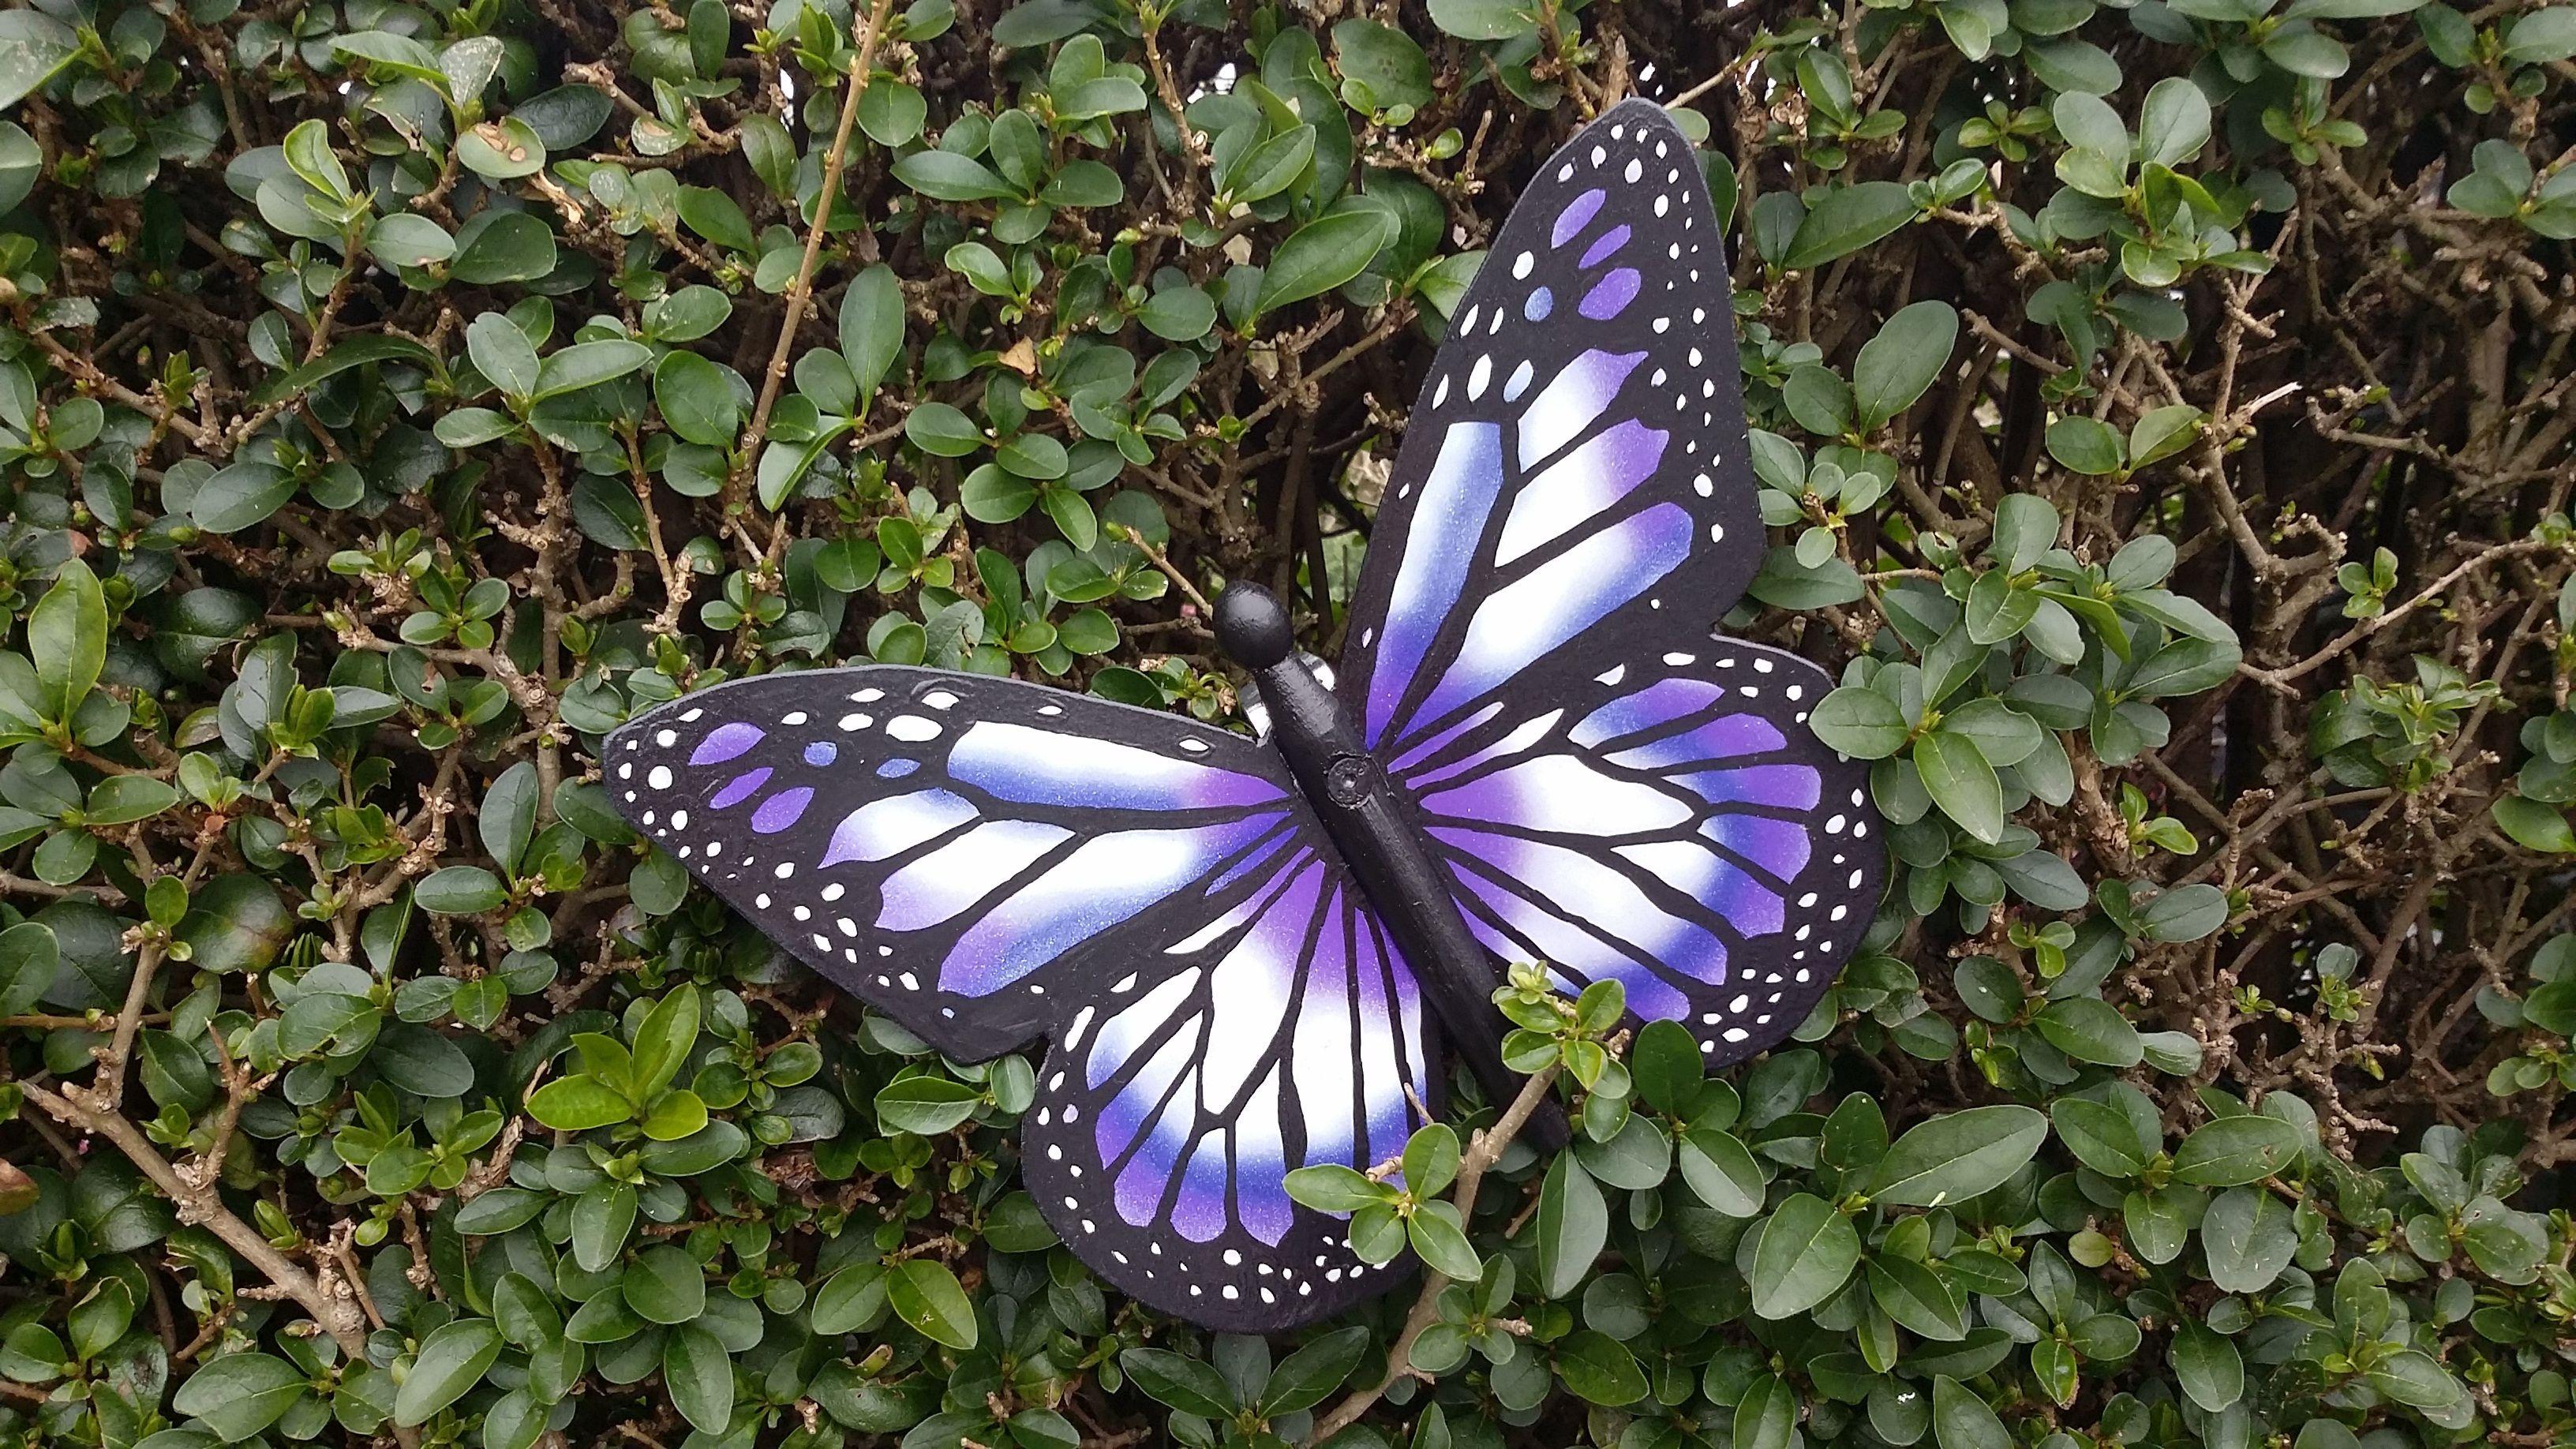 Garden wall ornaments - Butterfly Airbrushed Handpainted Metal Bespoke Garden Wall Art